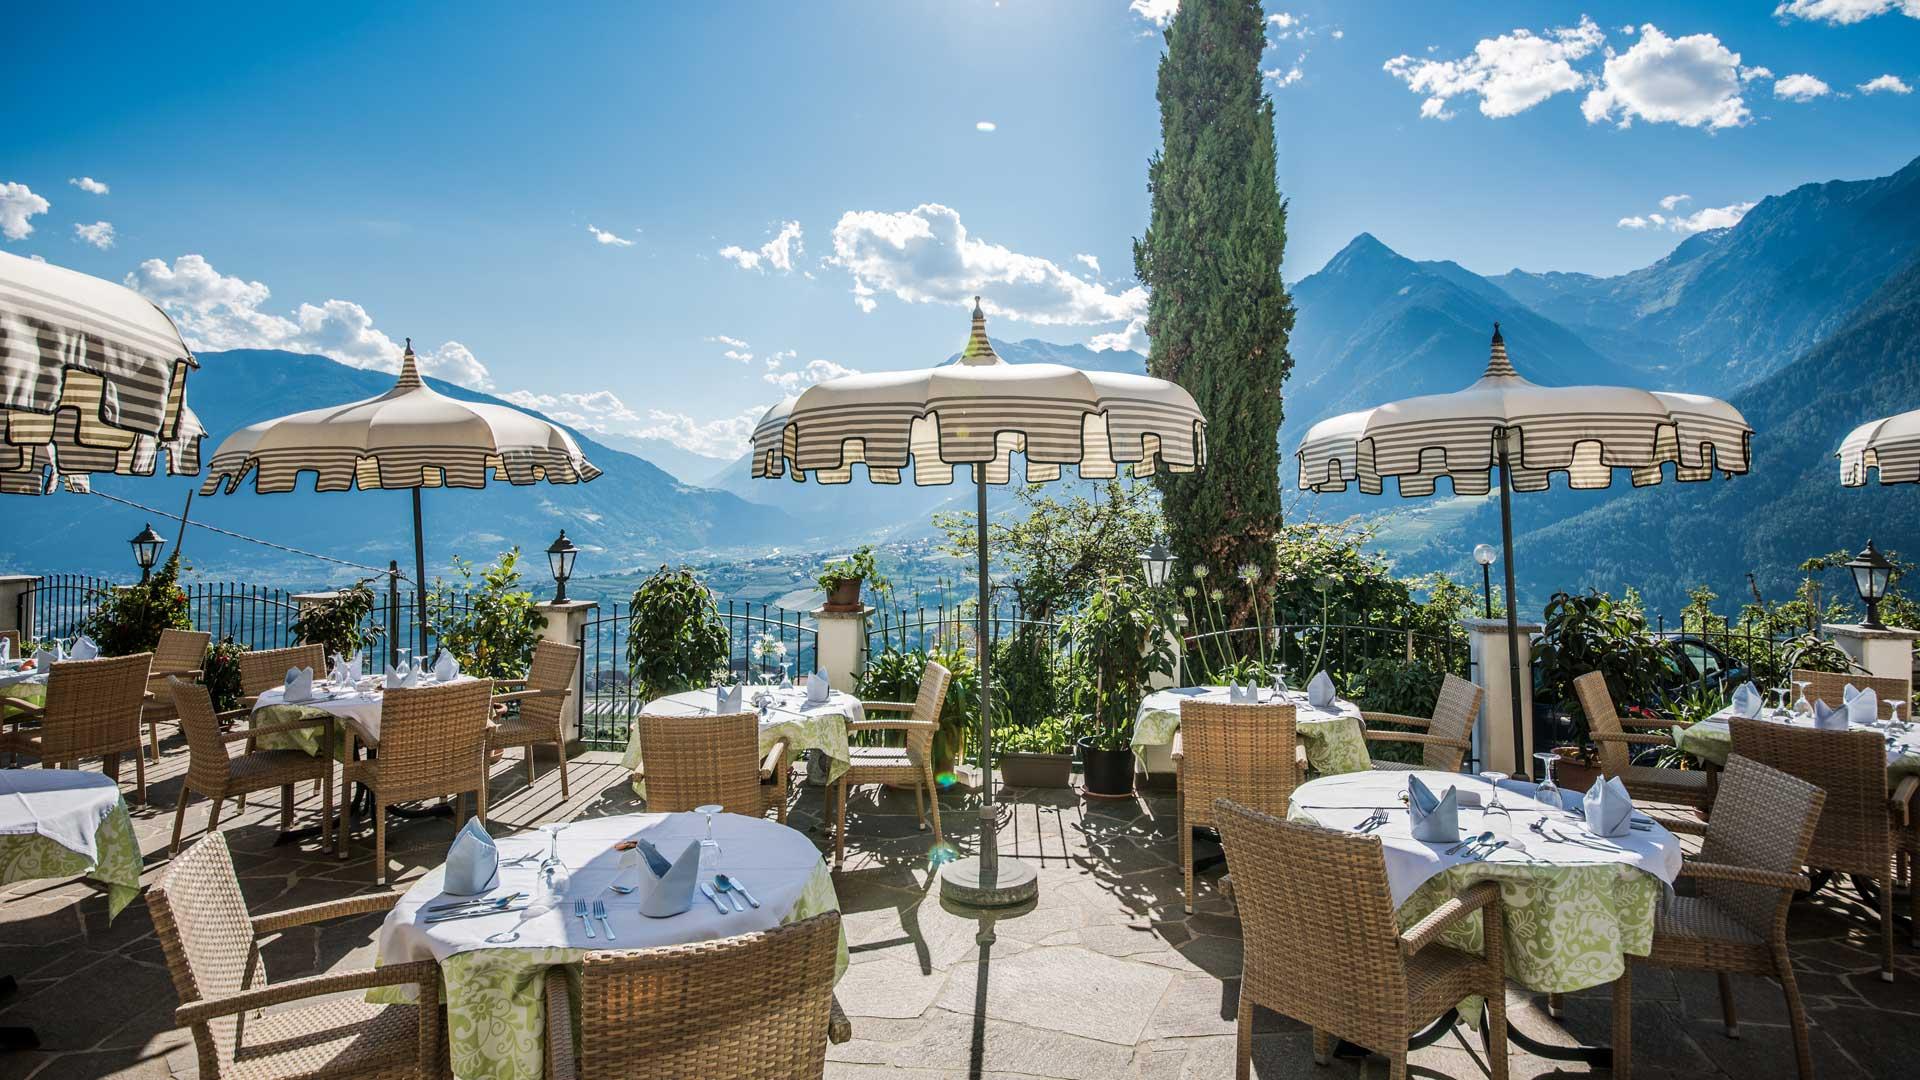 hotel schenna 3 sterne hotel alpenrose bei meran. Black Bedroom Furniture Sets. Home Design Ideas